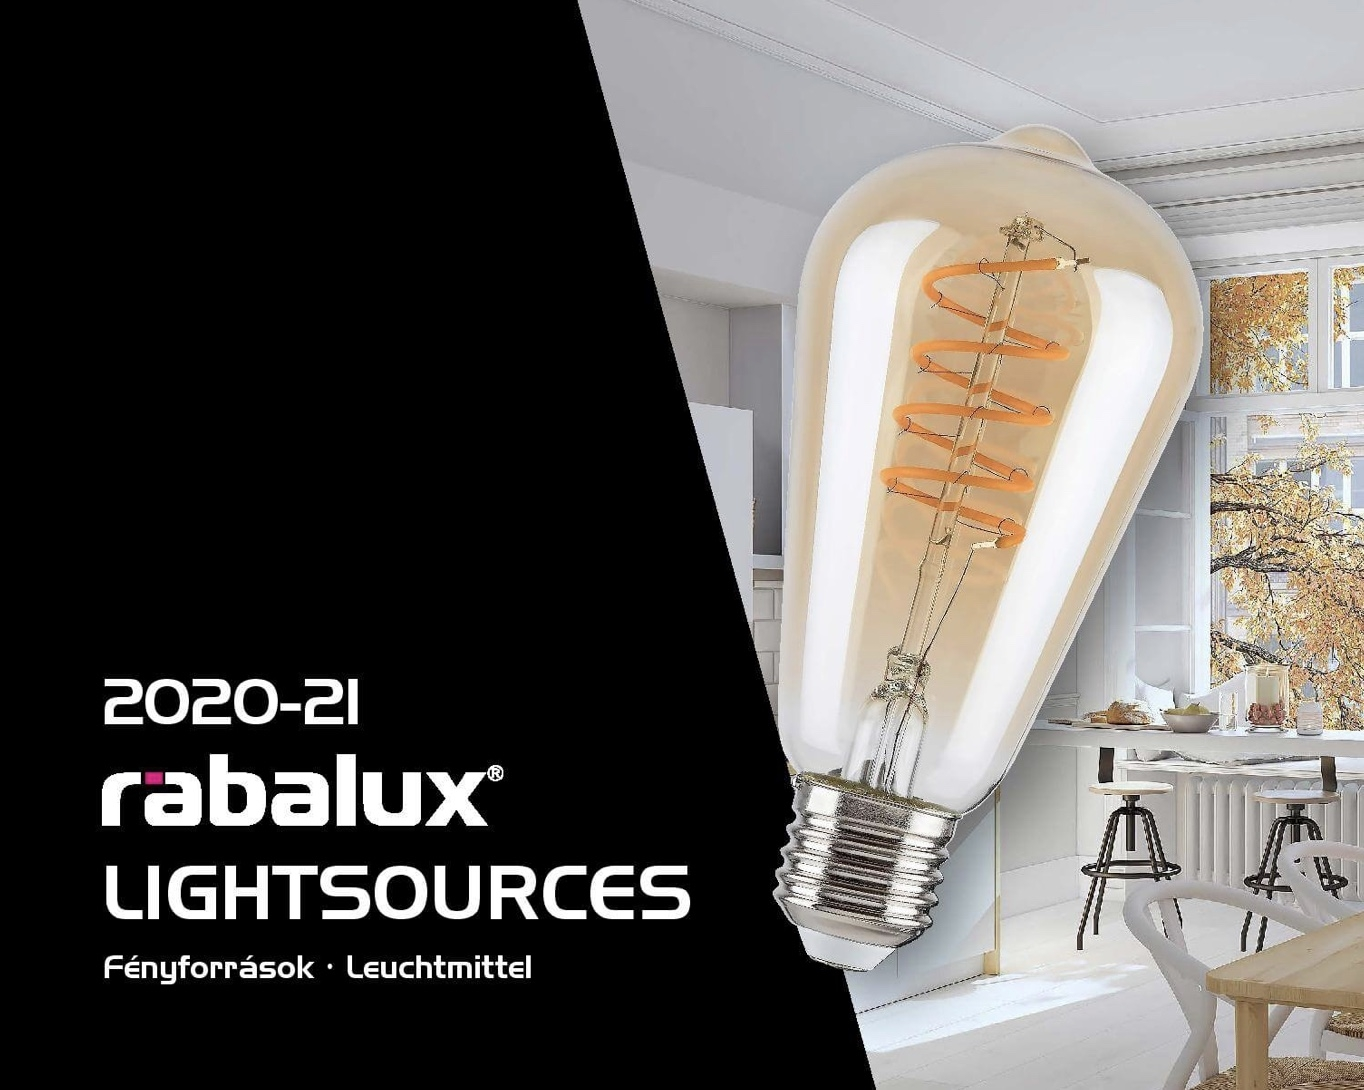 RABALUX Lightsources